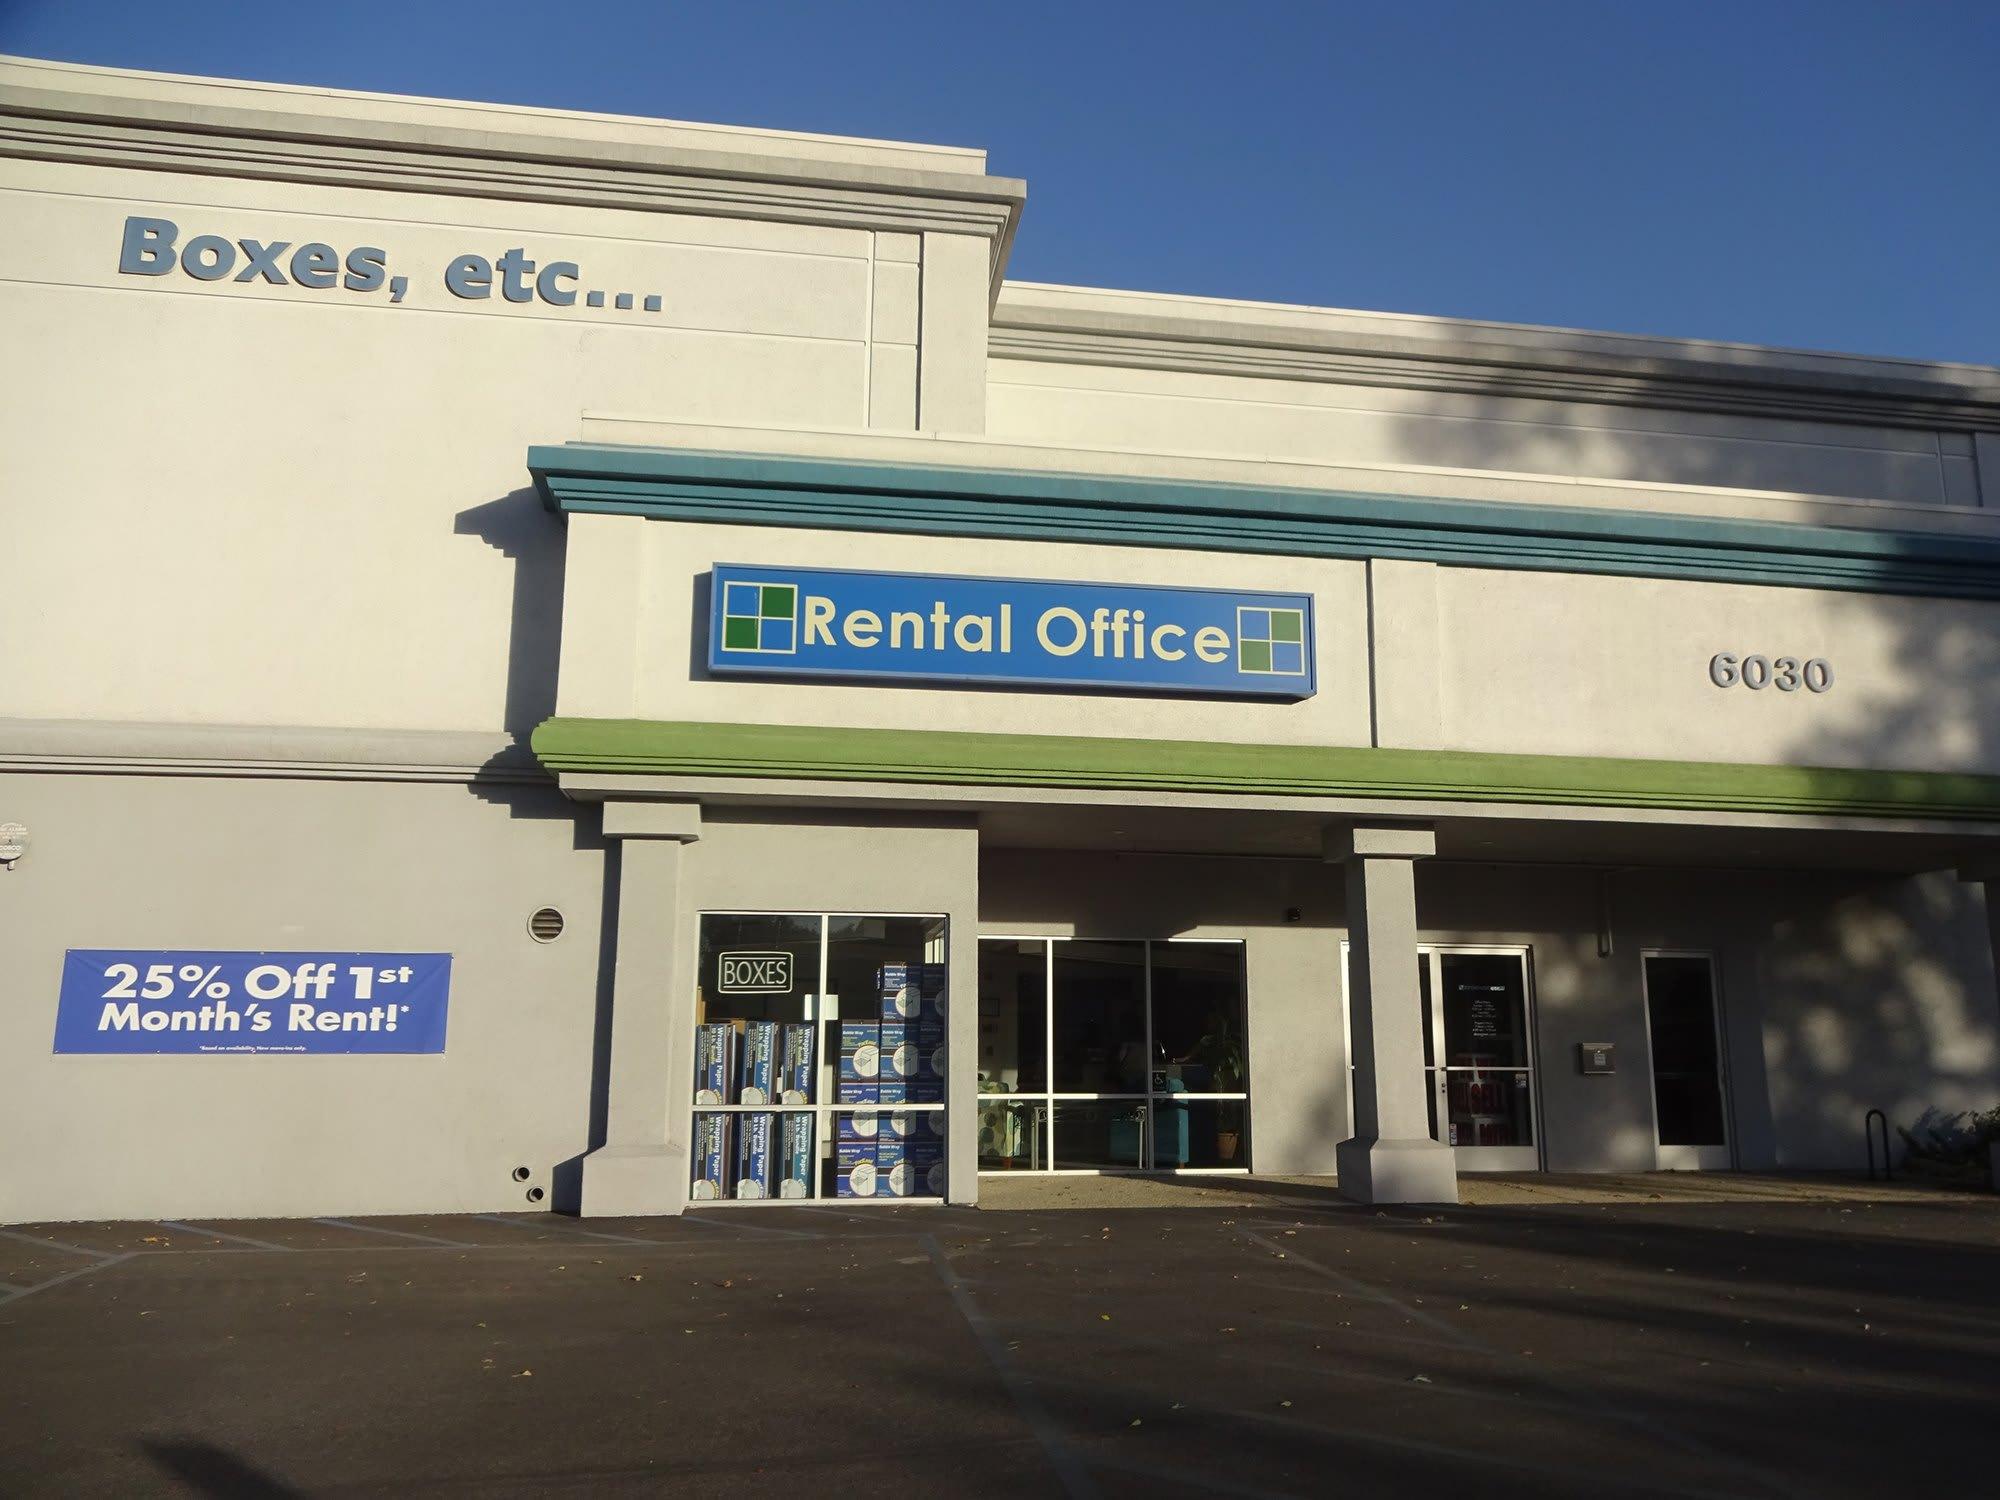 Self Storage Rental Office at Storage Etc... Woodland Hills